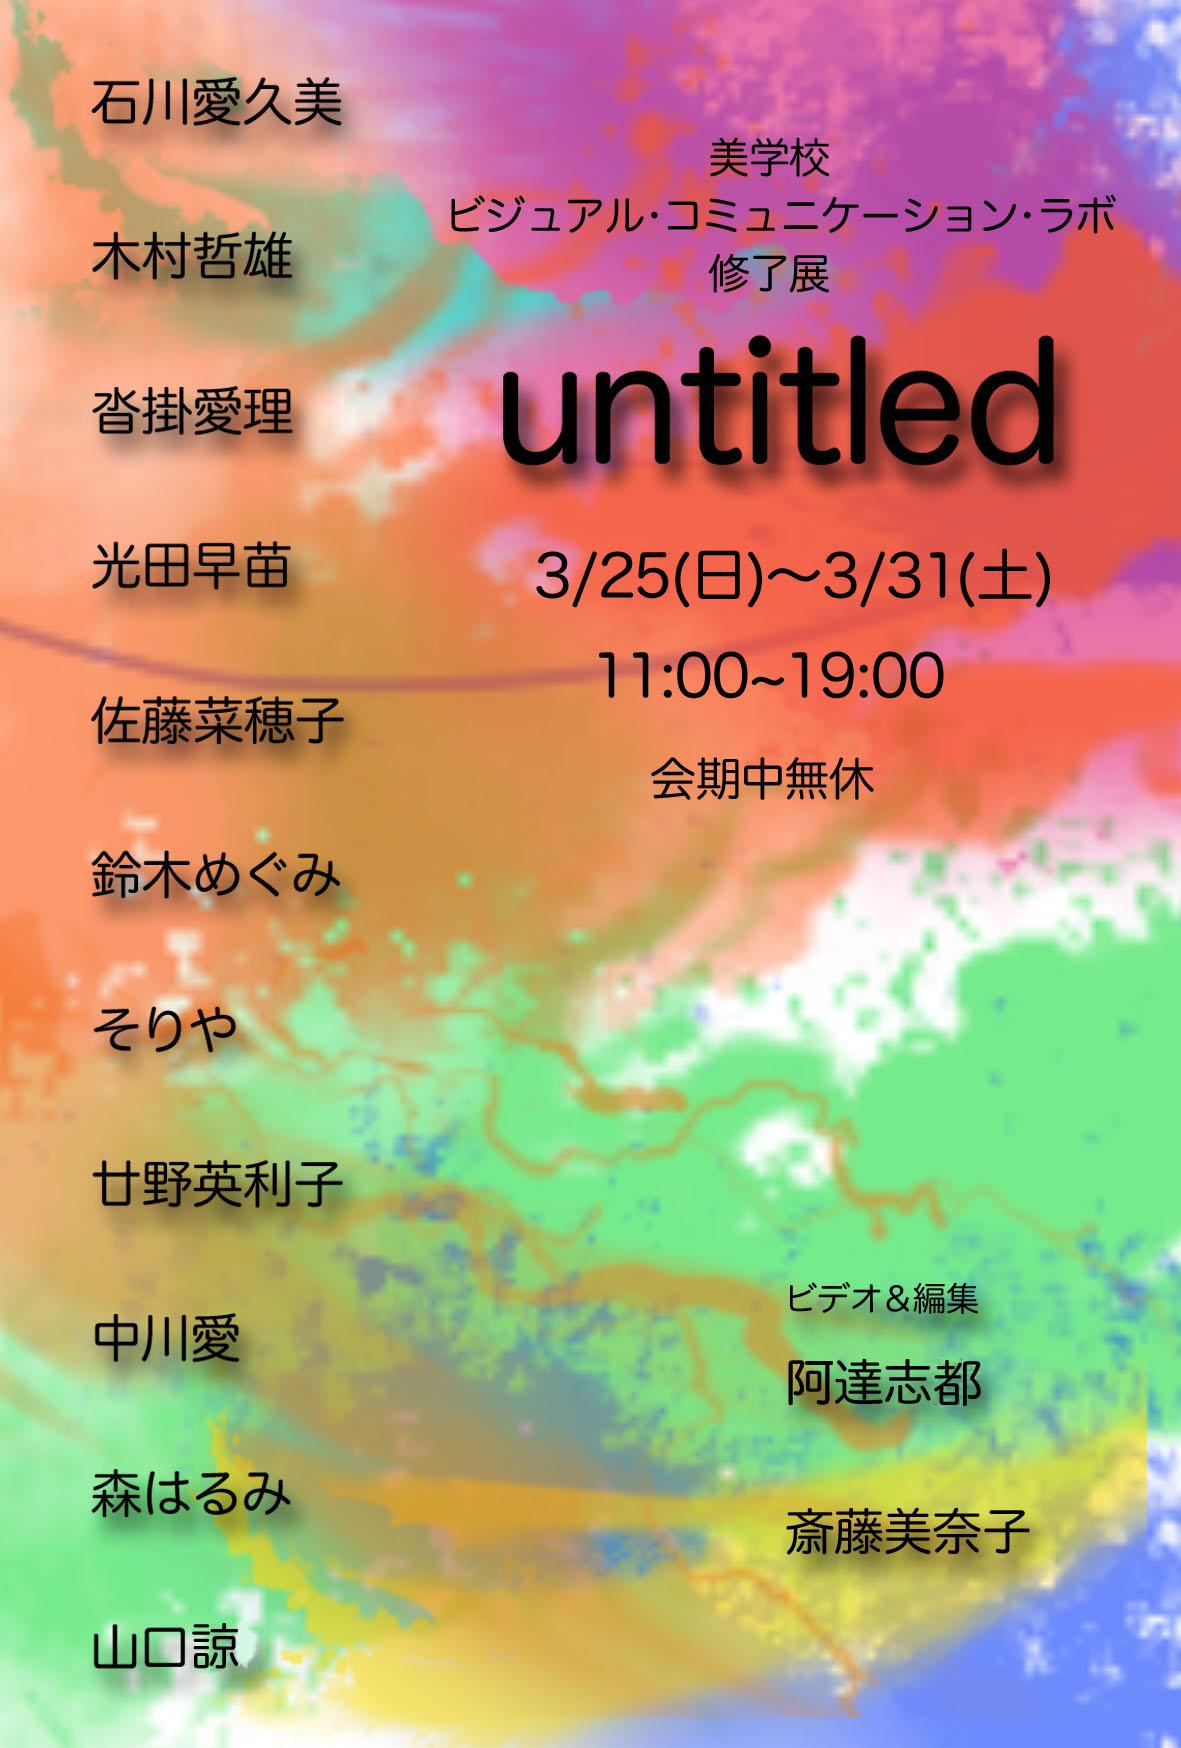 untitled 美学校/ビジュアル・コミュニケーション・ラボ 修了展_c0164399_17502787.jpg